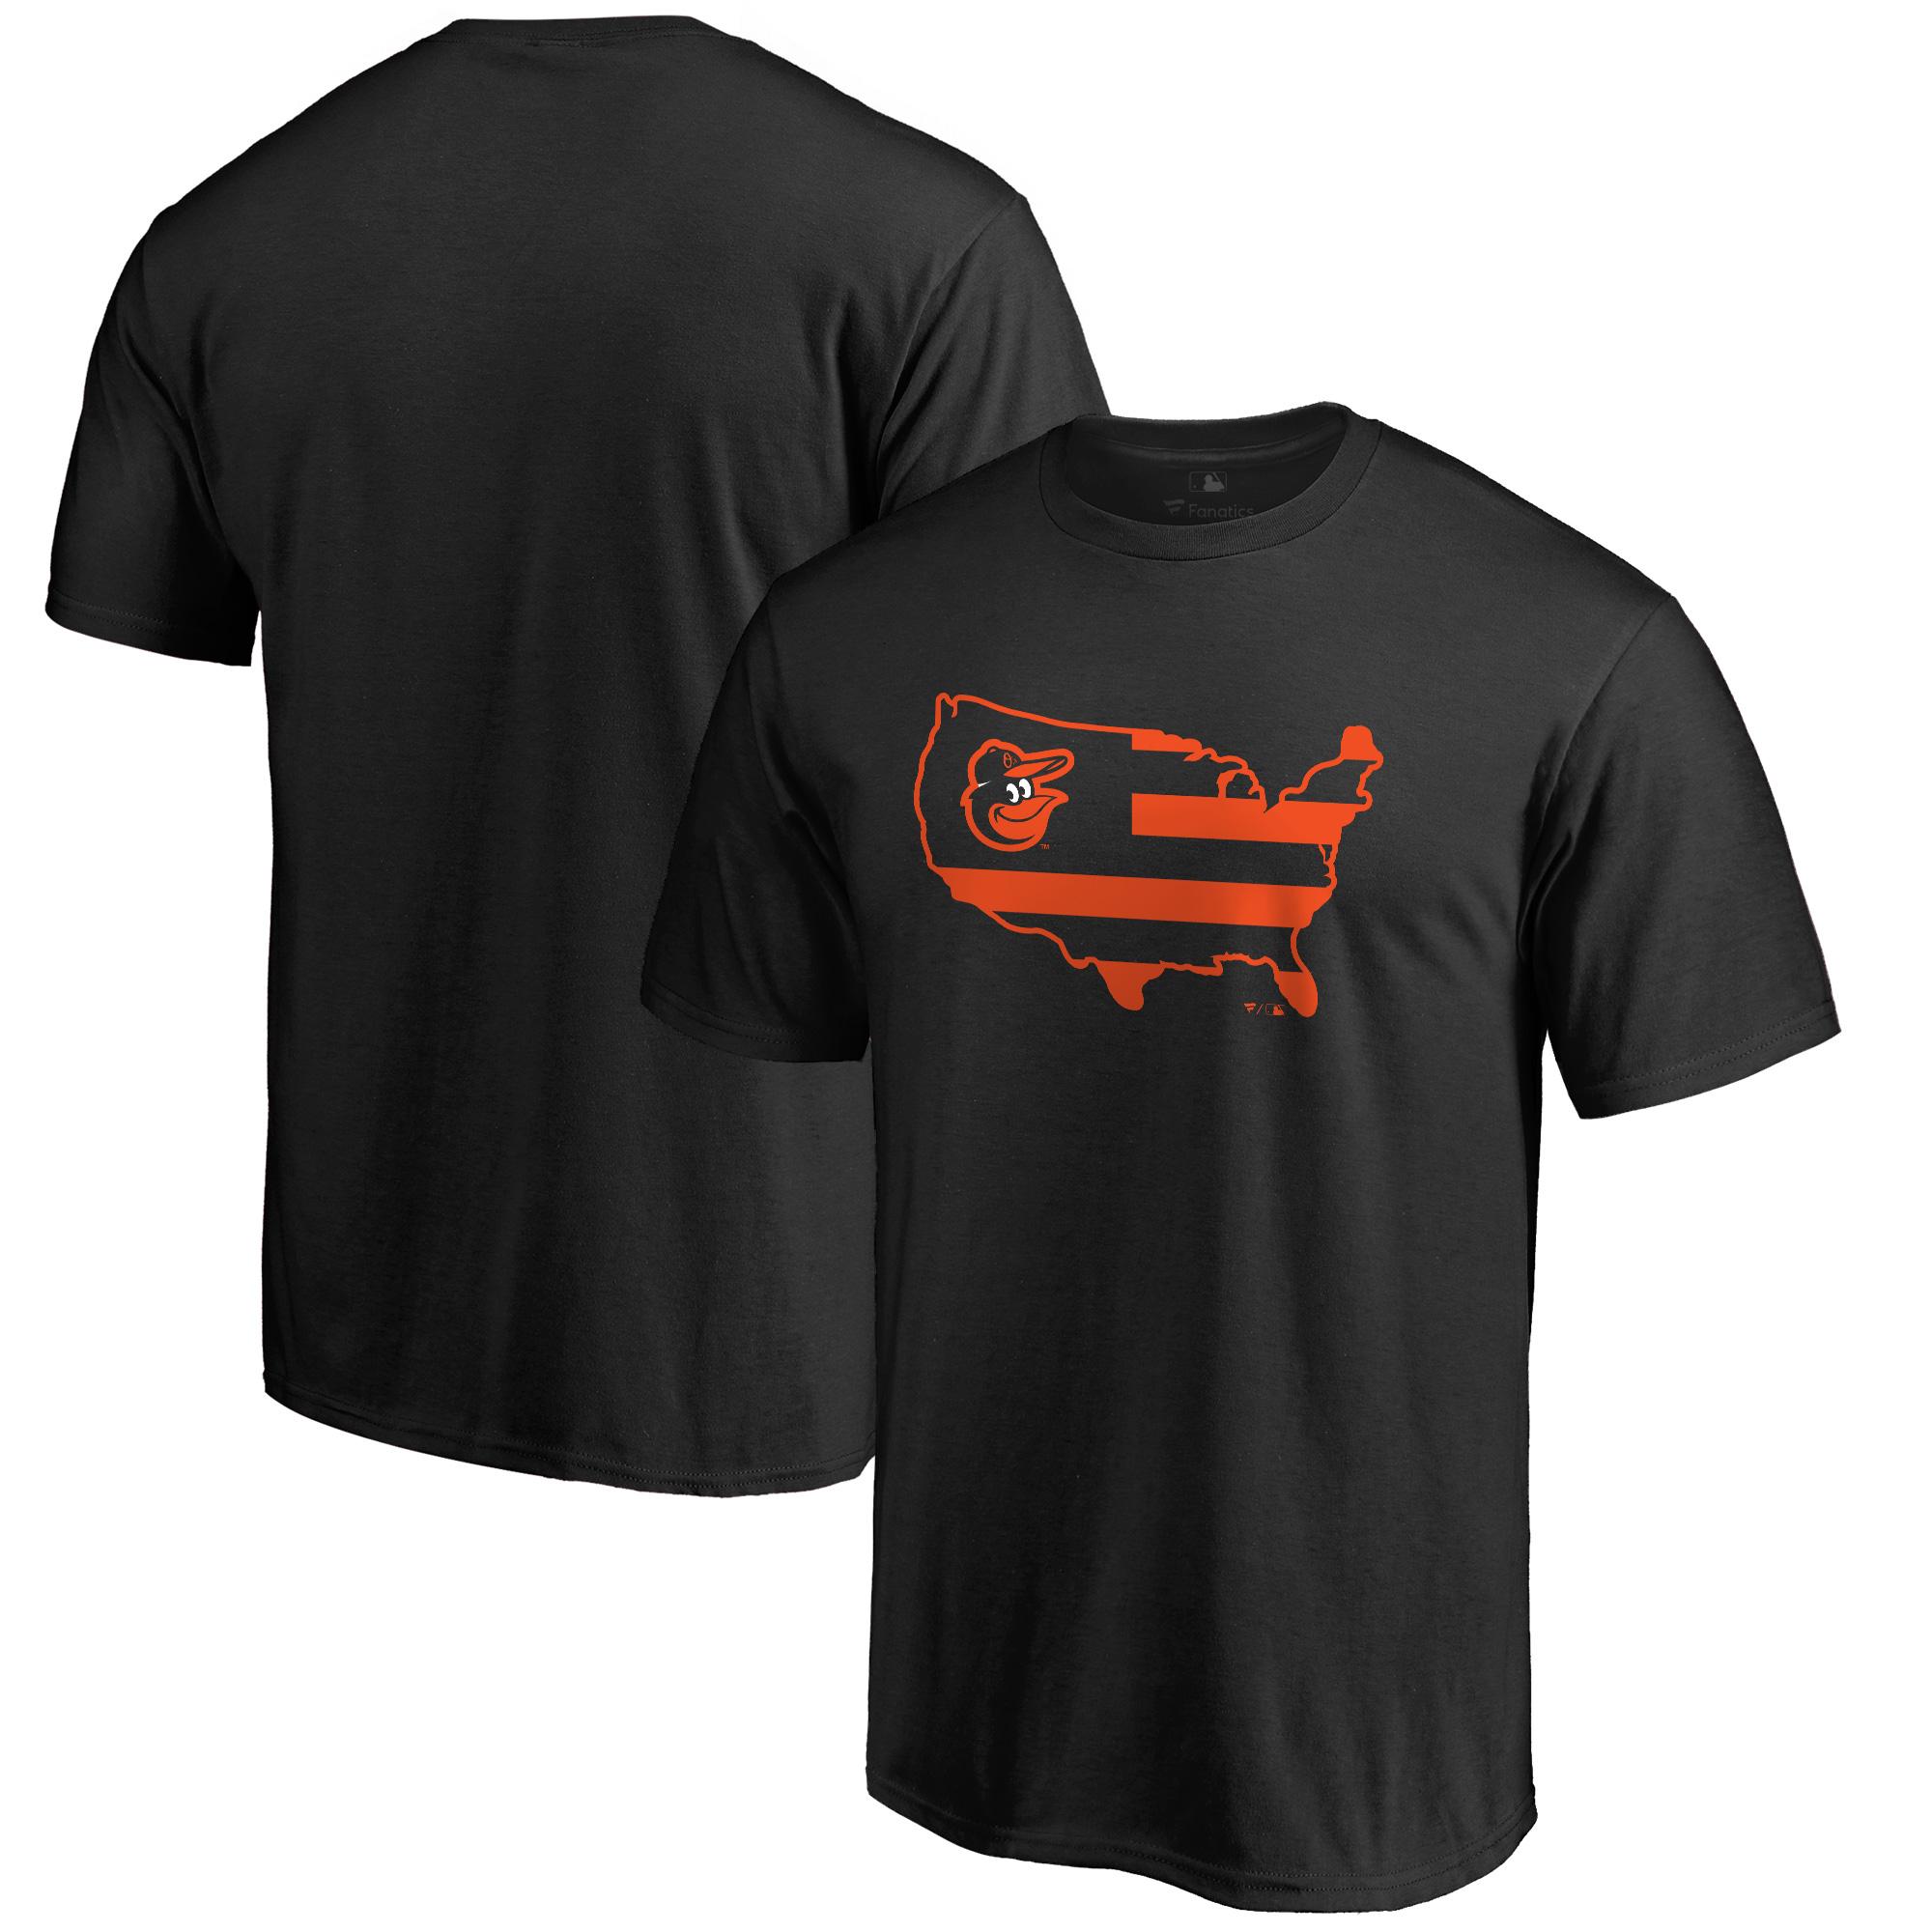 Men's Black Baltimore Orioles Broad Stripes T-Shirt